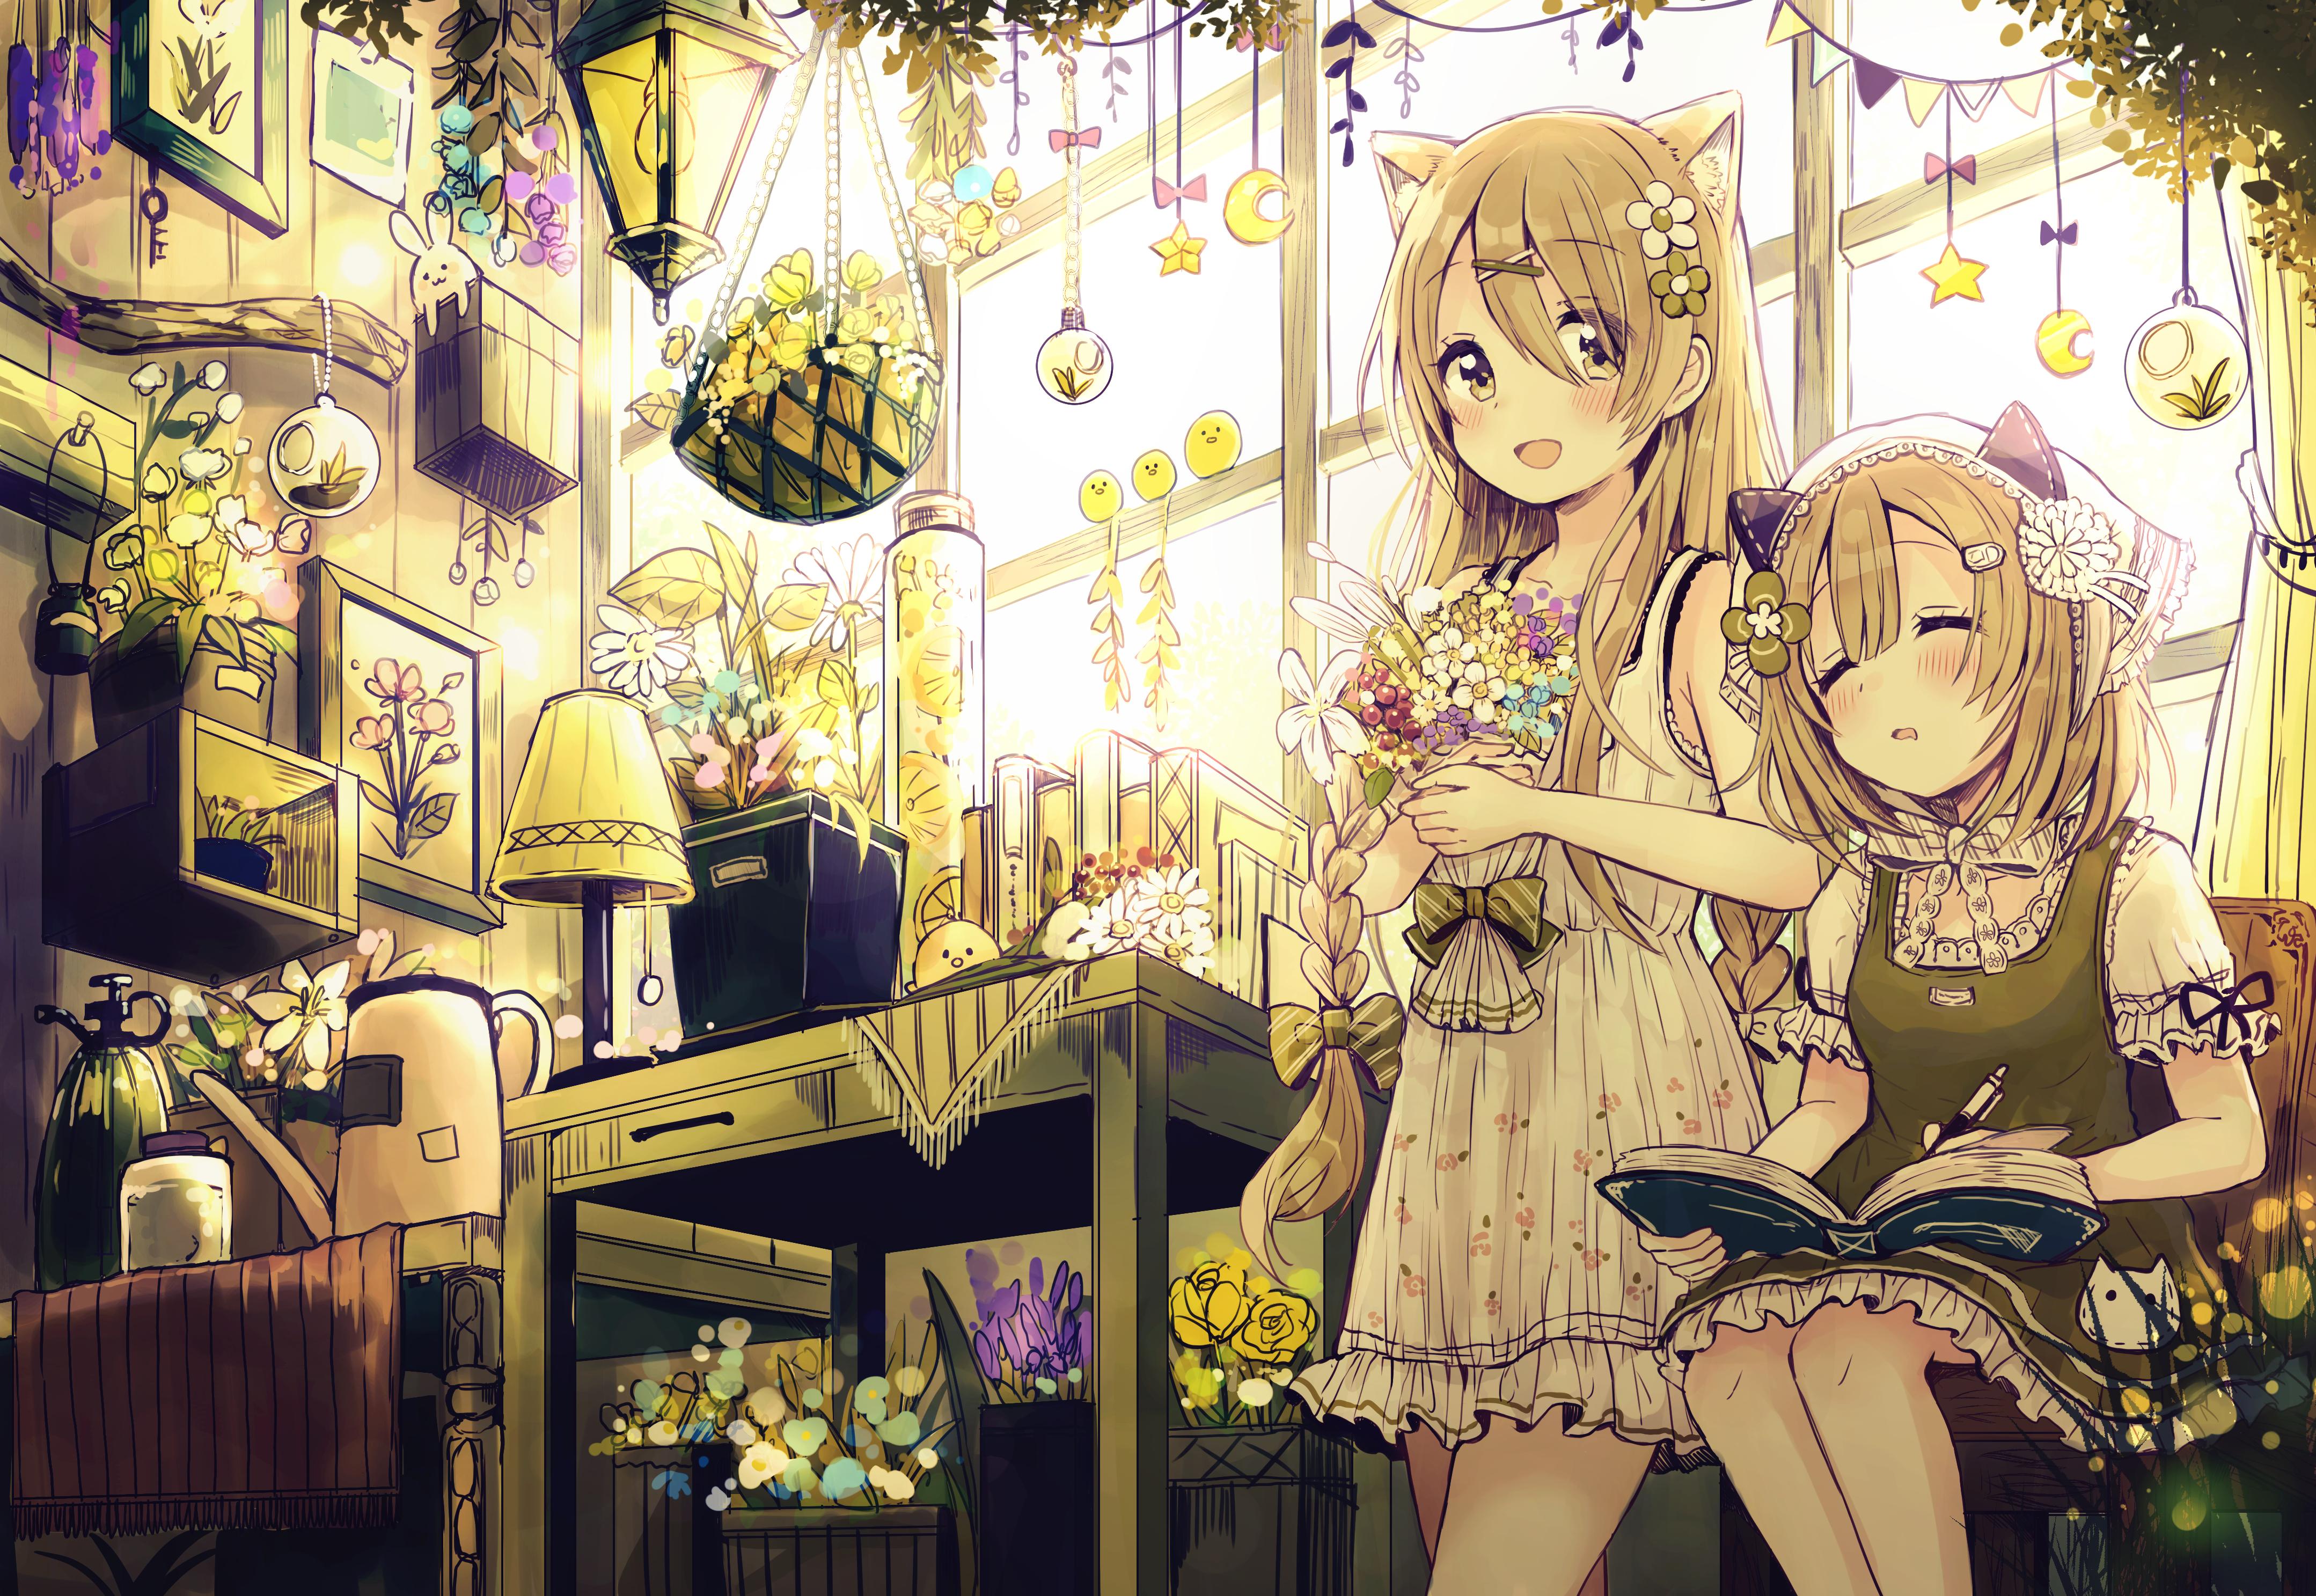 Fondos De Pantalla Anime Chicas Anime Linterna Orejas